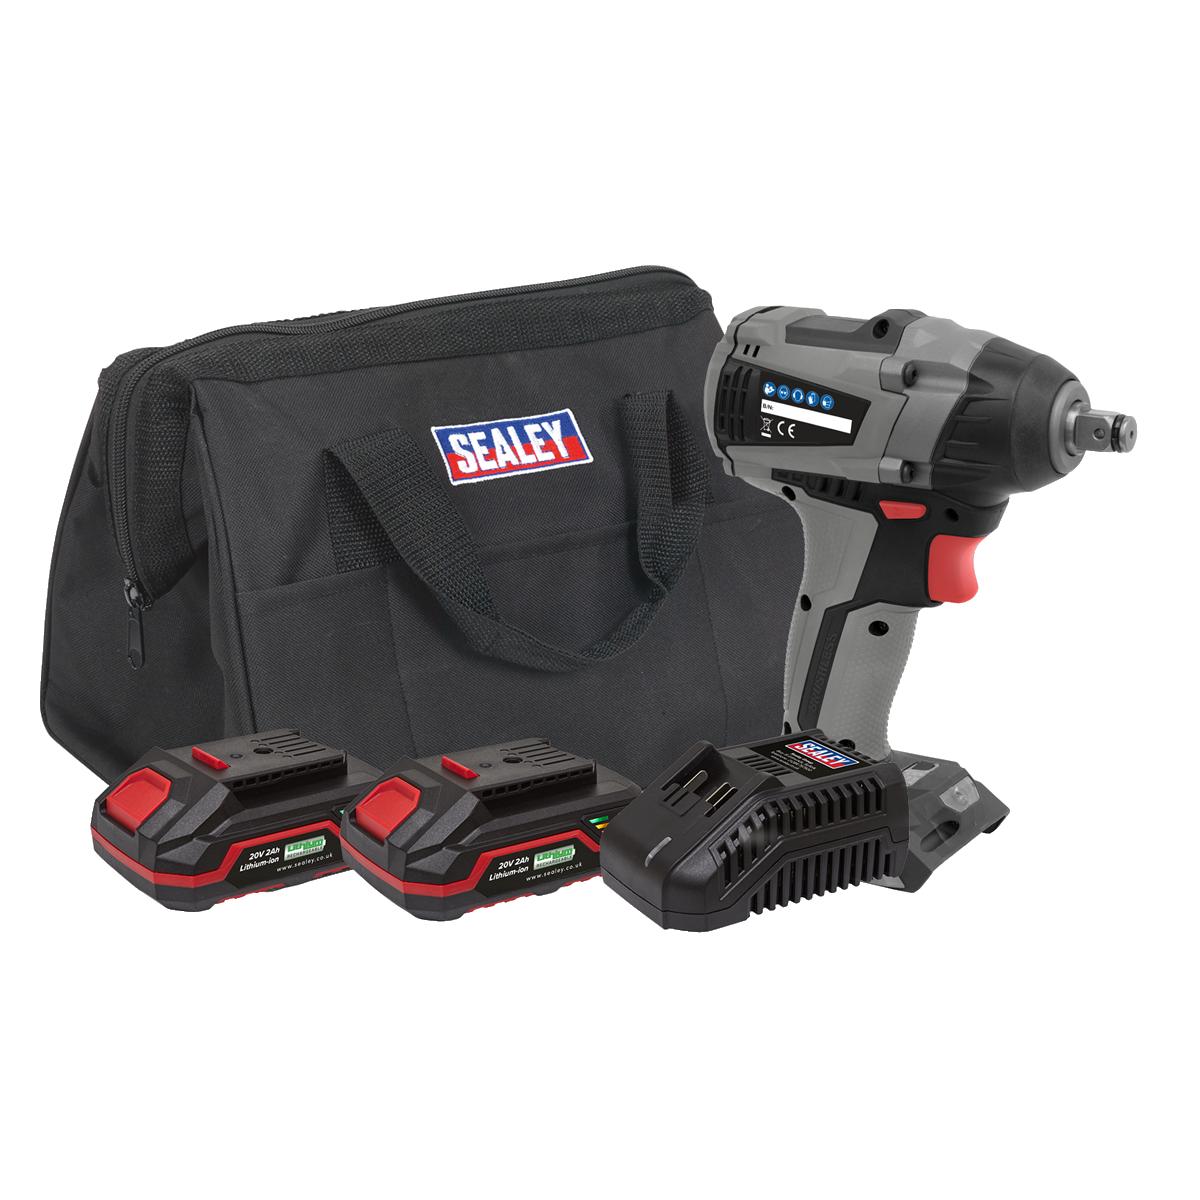 "Brushless Impact Wrench Kit 1/2""Sq Drive 20V 300Nm - 2 Batteries"